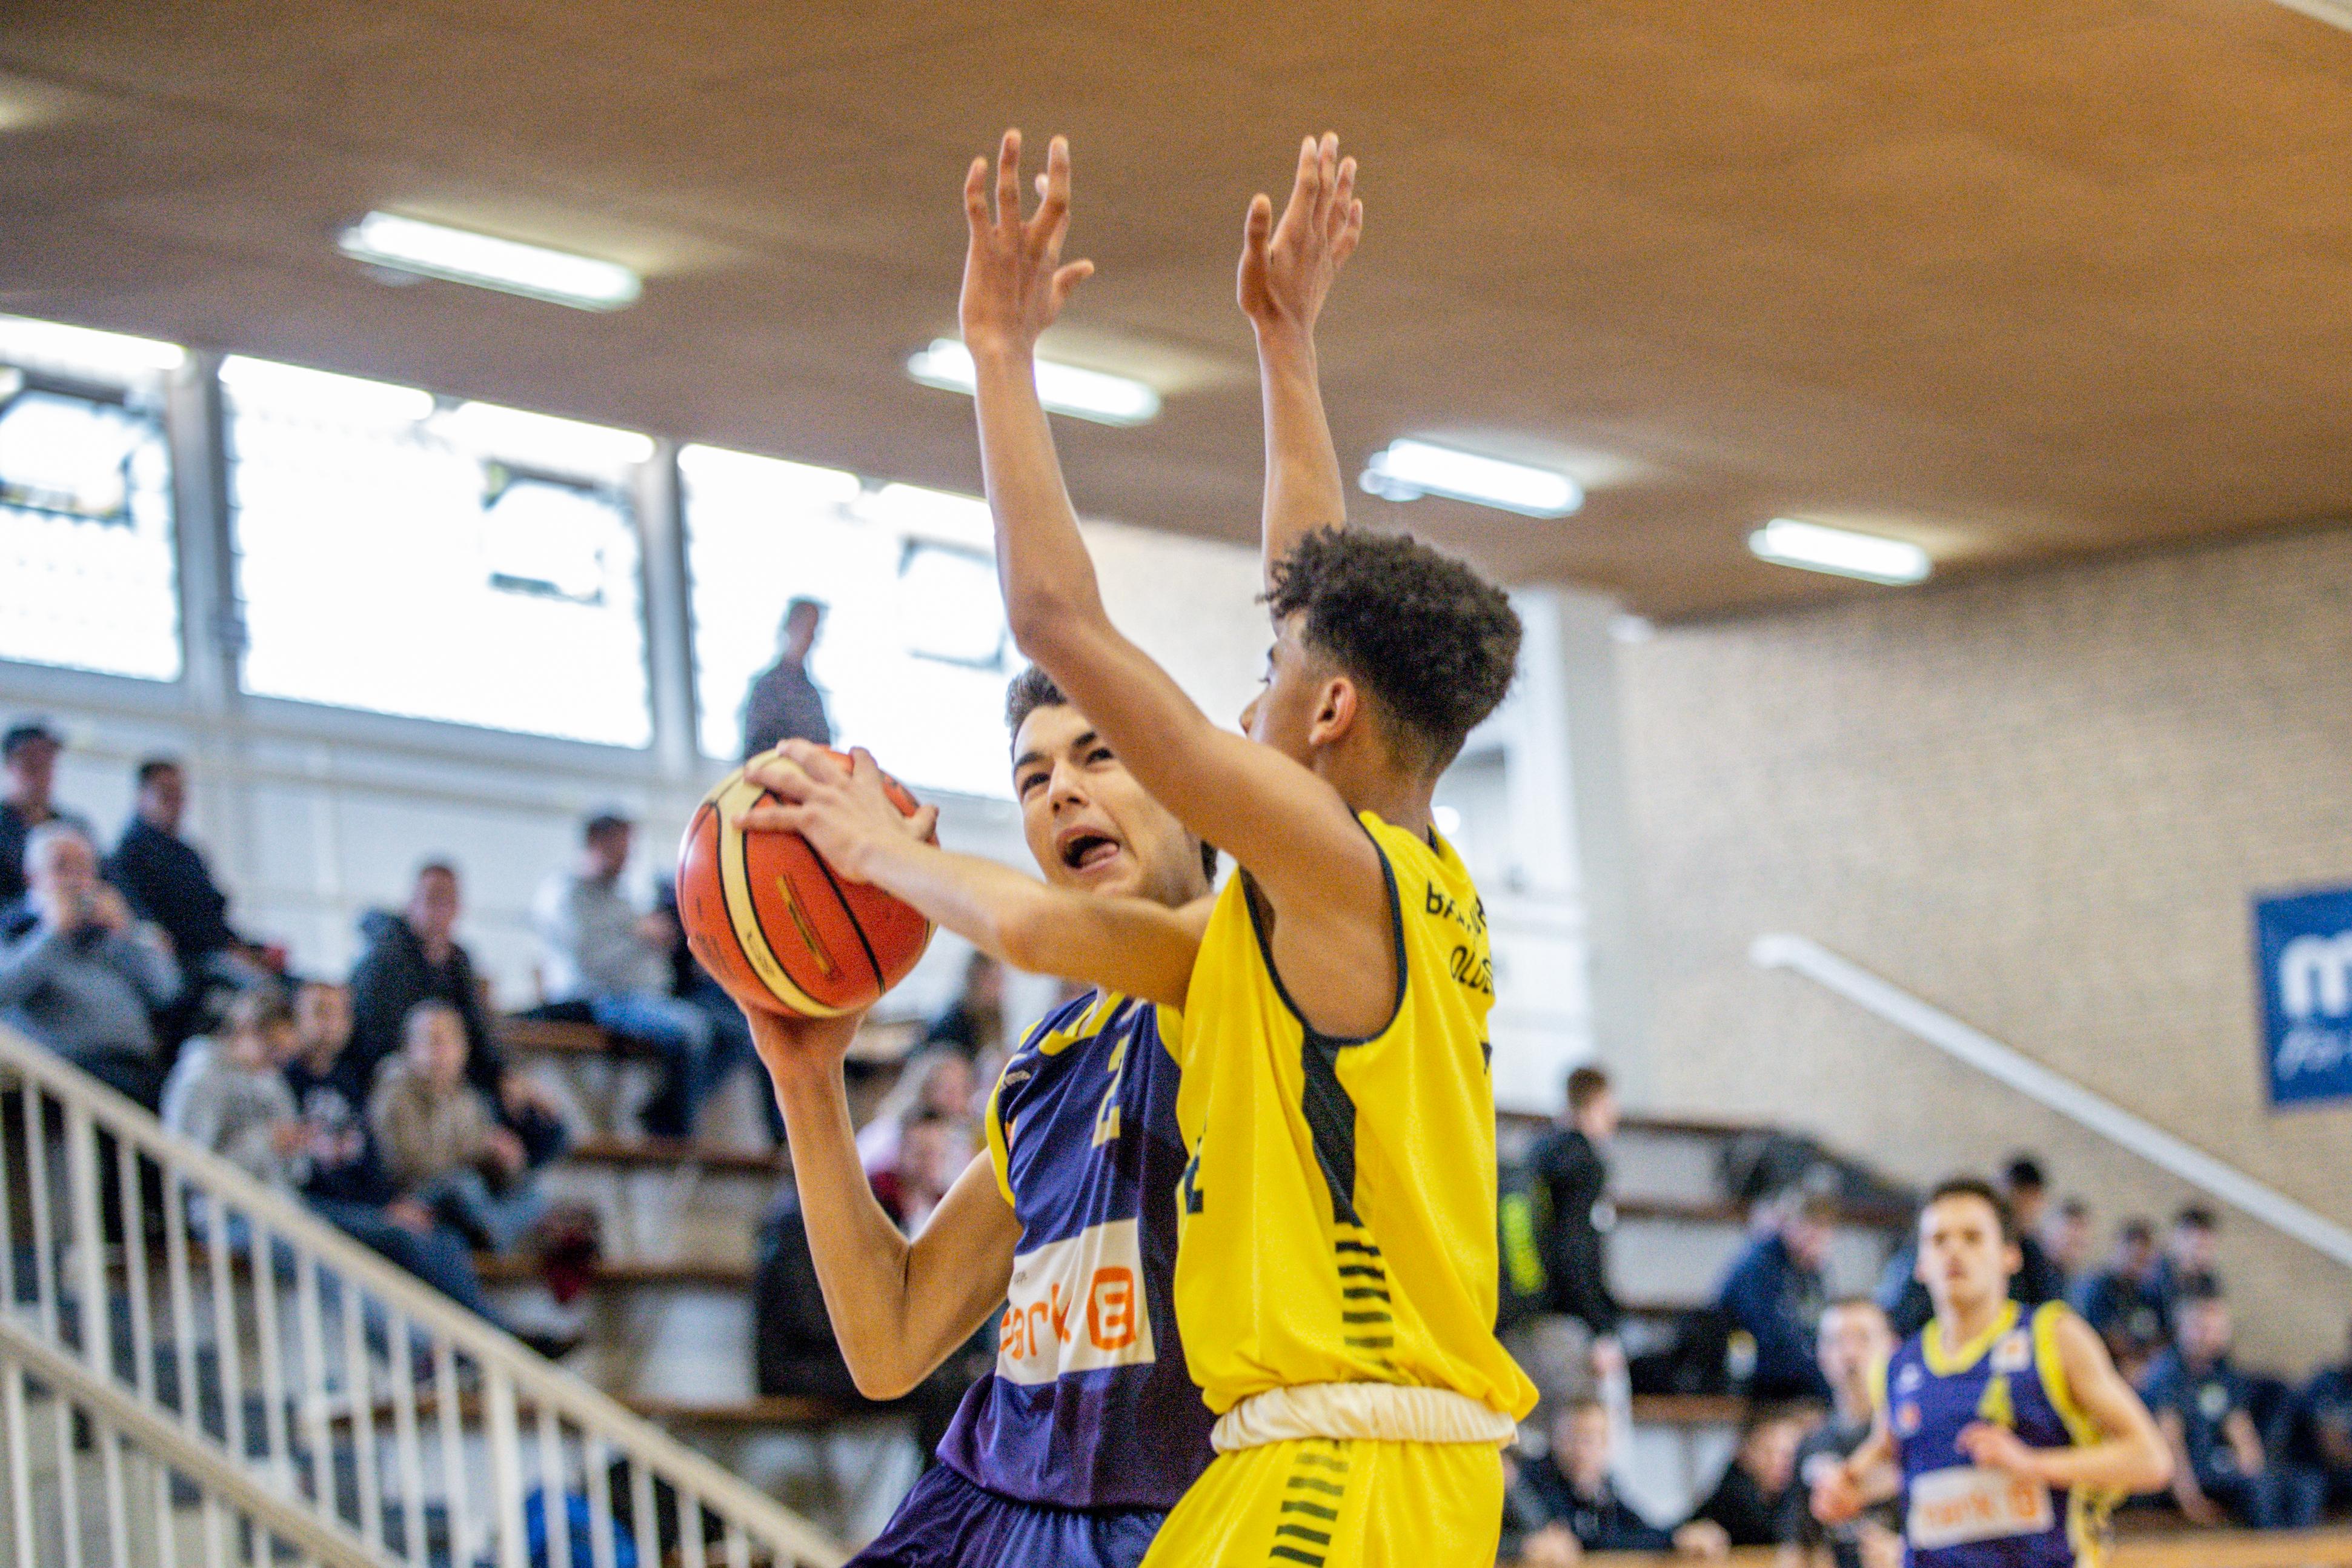 13.10.2019, Oldenburg, Sporthalle Haarenufer: JBBL | EWE Baskets Juniors - Phoenix Hagen Youngsters  //  Luka ZAJIC (#2 Phoenix Hagen Youngsters/JBBL), Tyrell NWAKI (#7 EWE Baskets Juniors/JBBL)  || Foto: Erik Hillmer